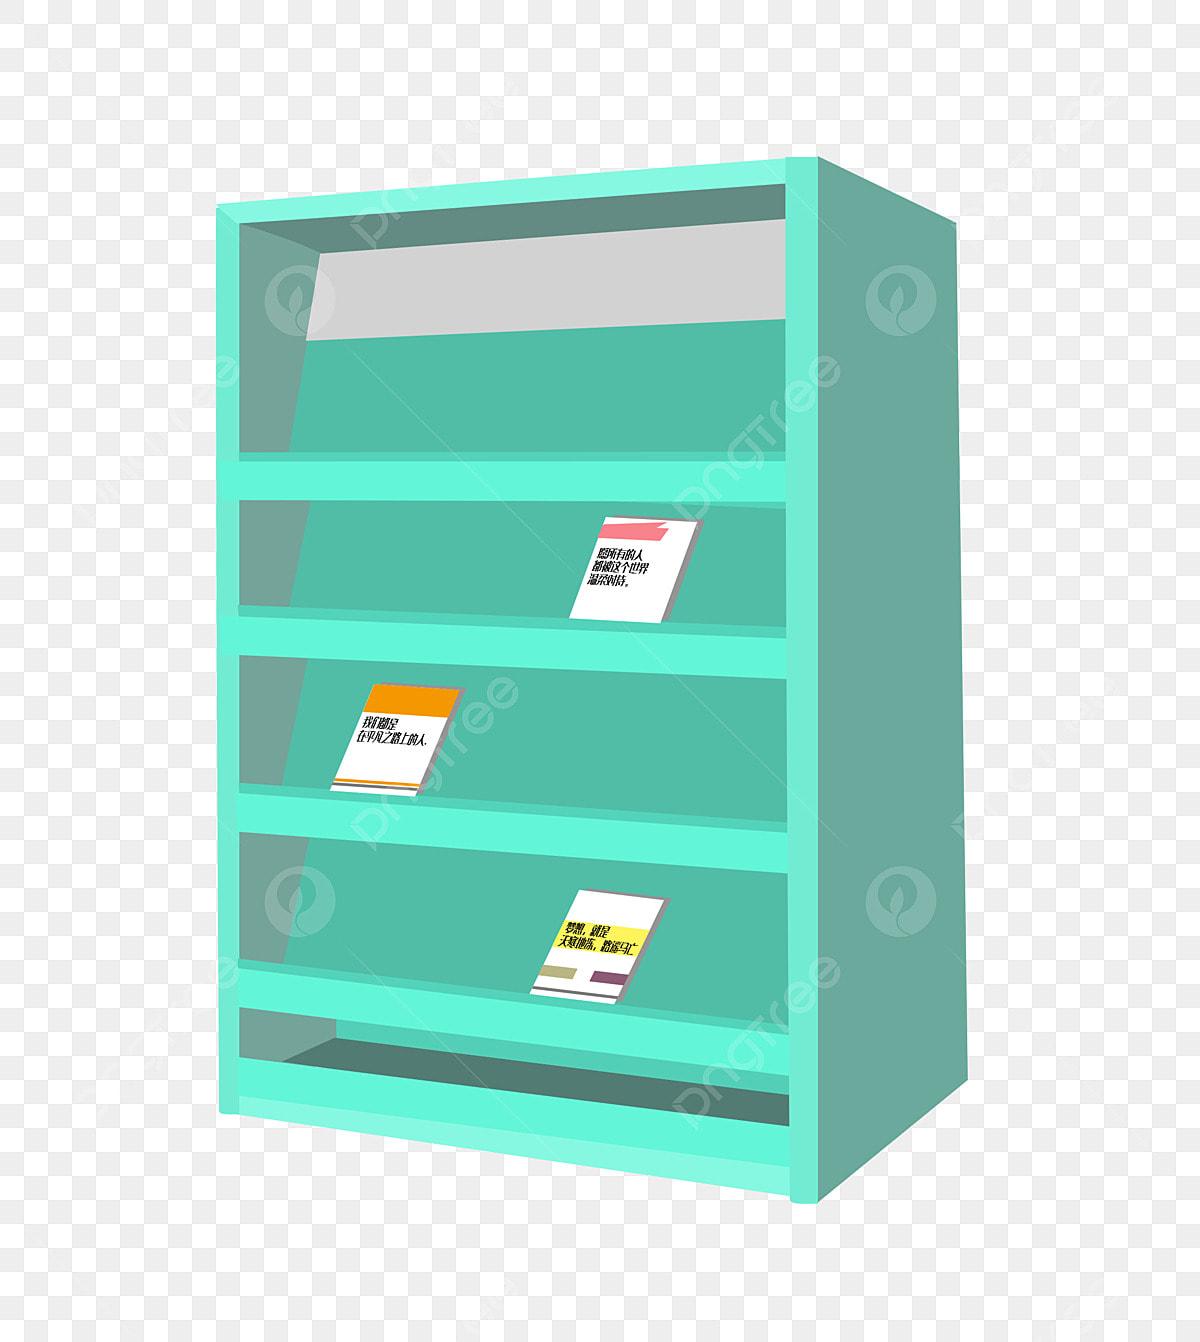 Green Office Cabinet Illustration, Cabinet, Office ...